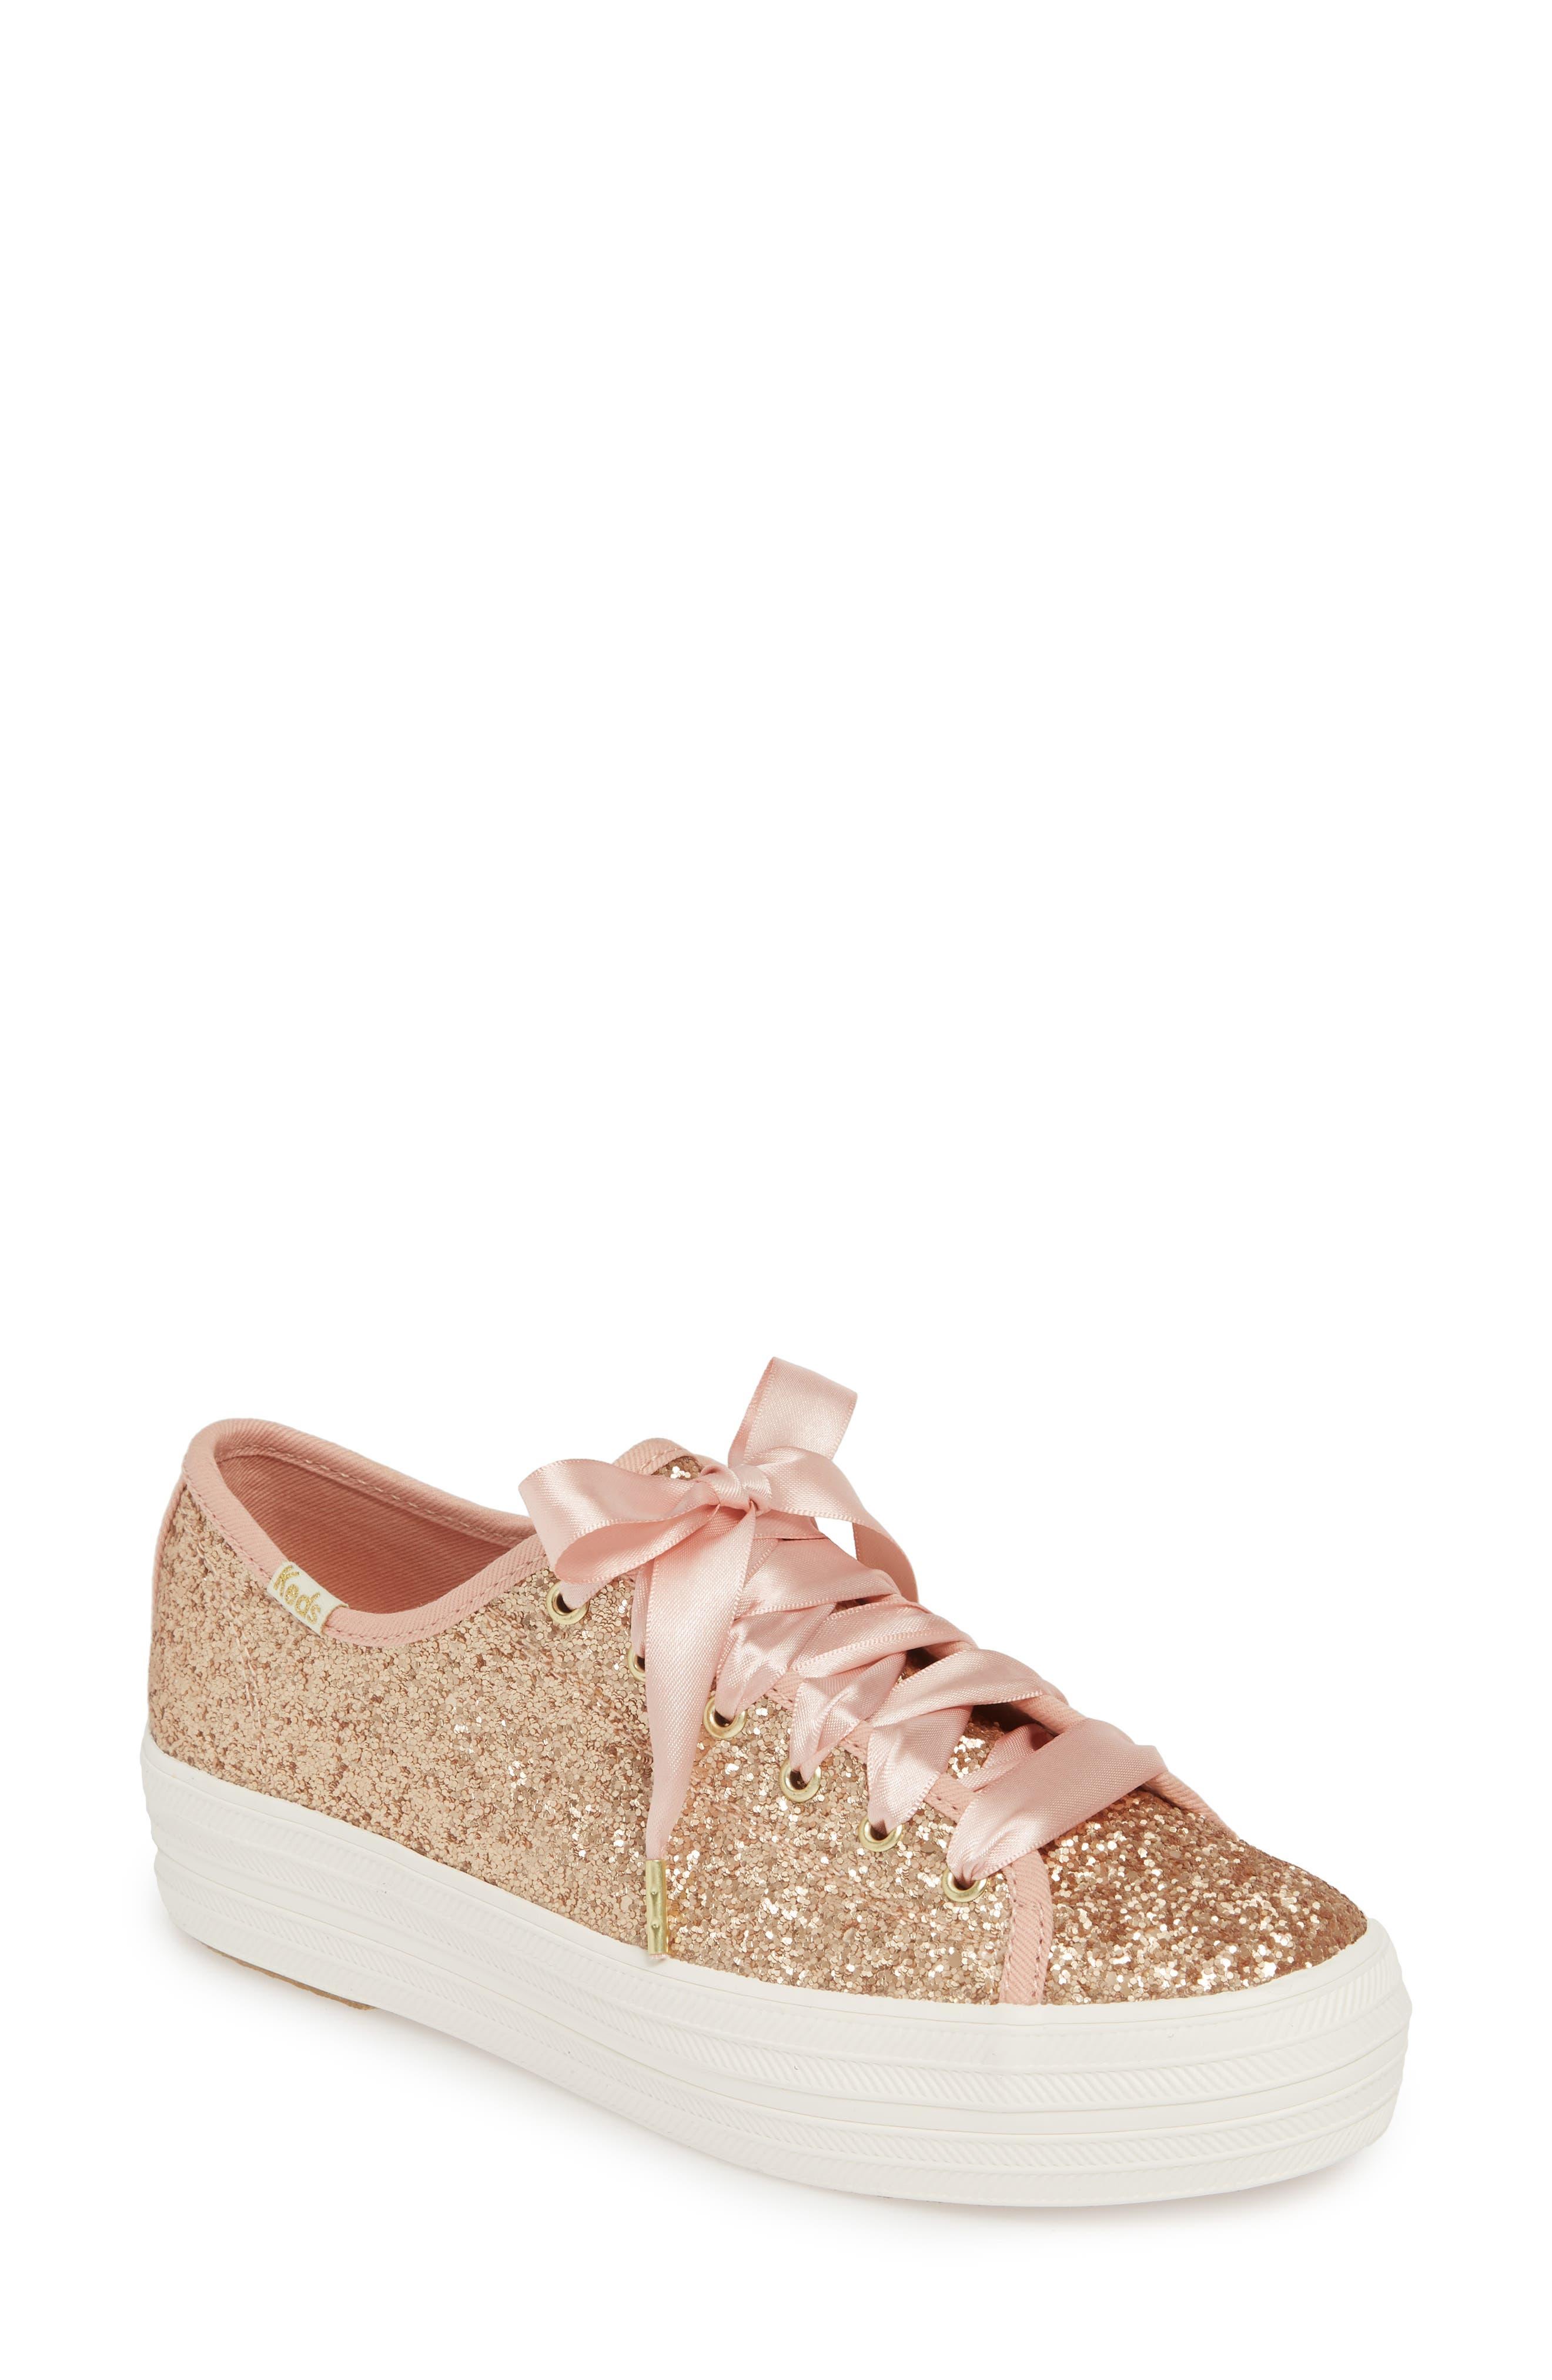 KEDS<SUP>®</SUP> FOR KATE SPADE NEW YORK Keds<sup>®</sup> x kate spade new york Triple Kick Glitter Sneaker, Main, color, ROSE GOLD